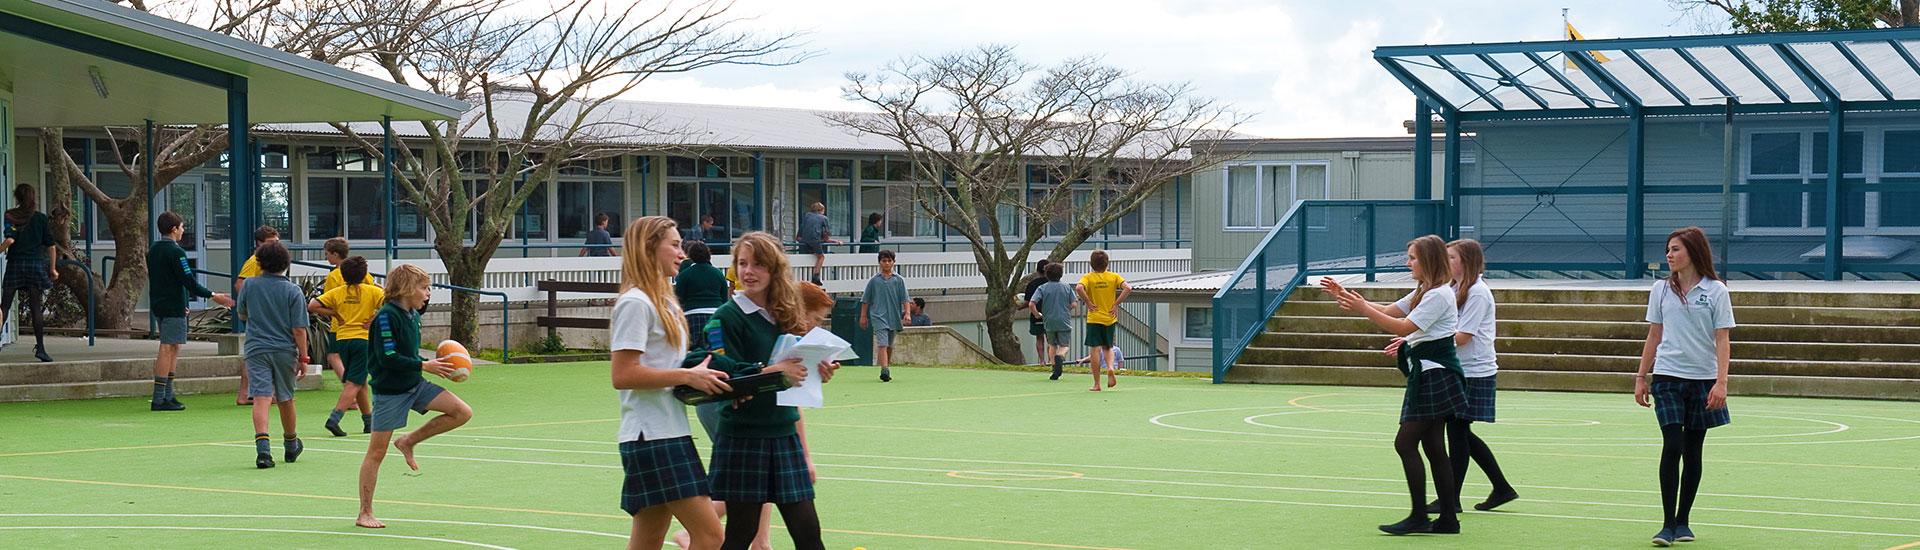 Intermediate schools in New Zealand videos